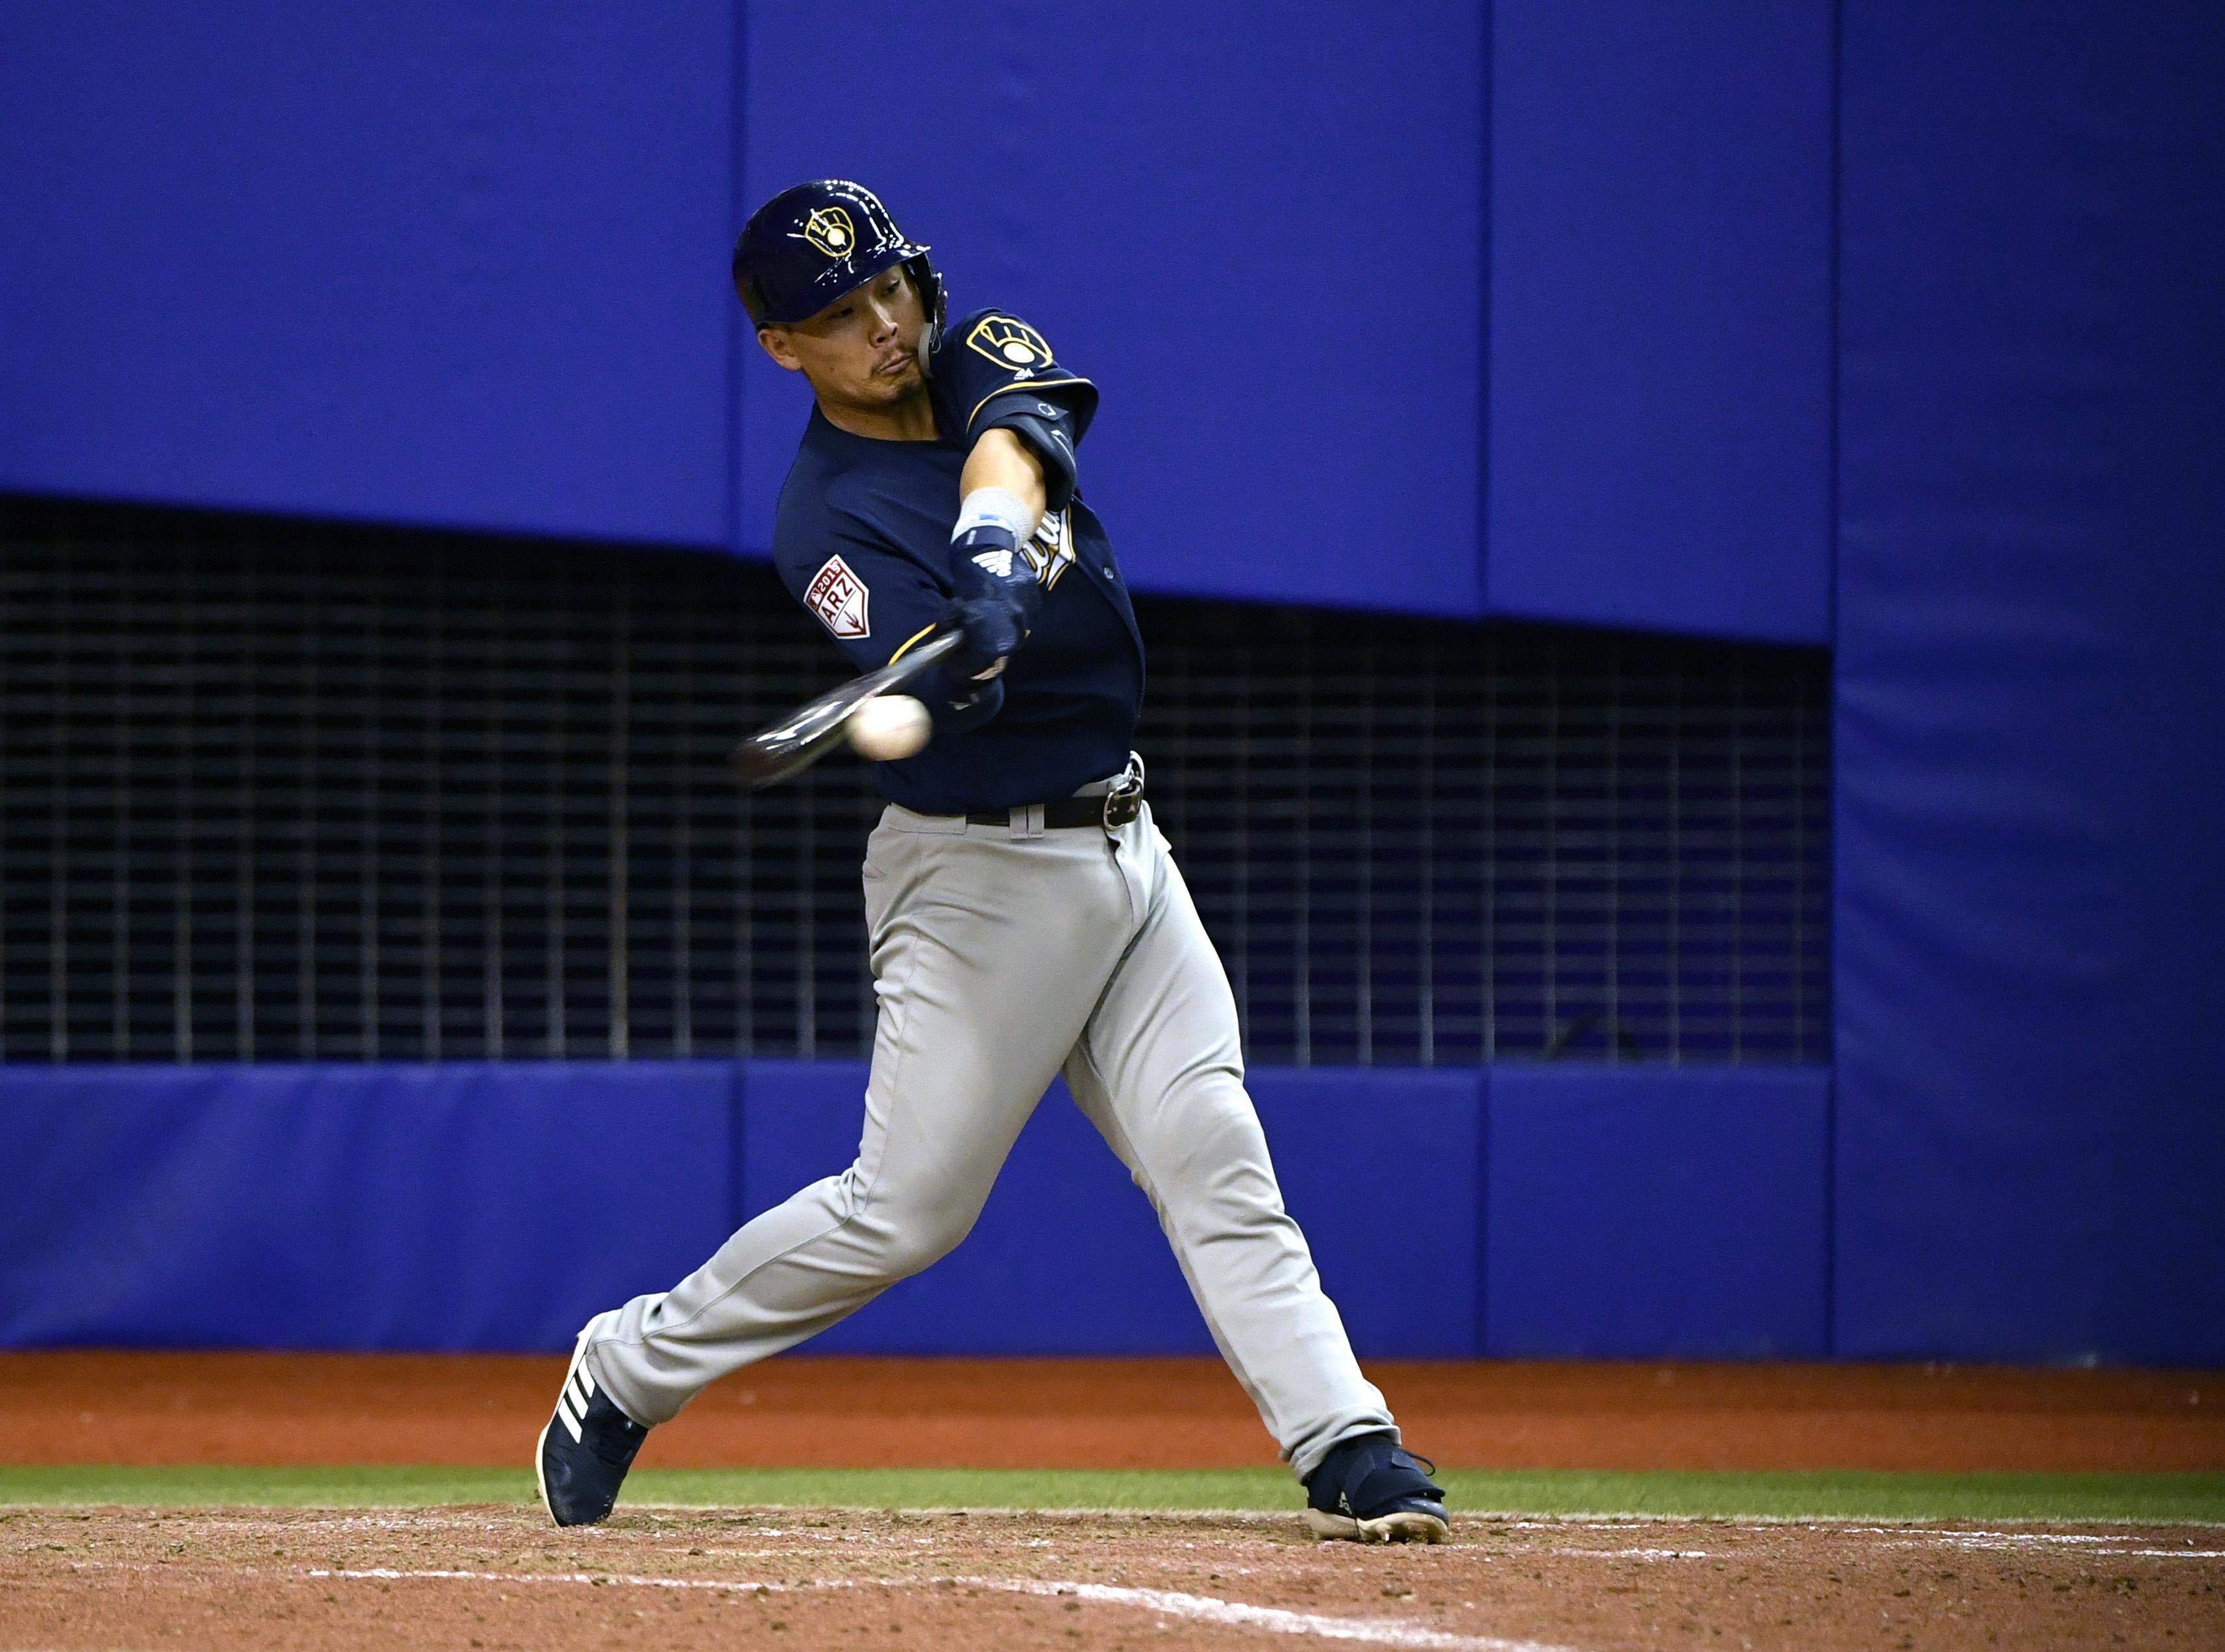 MLB: Spring Training-Milwaukee Brewers at Toronto Blue Jays